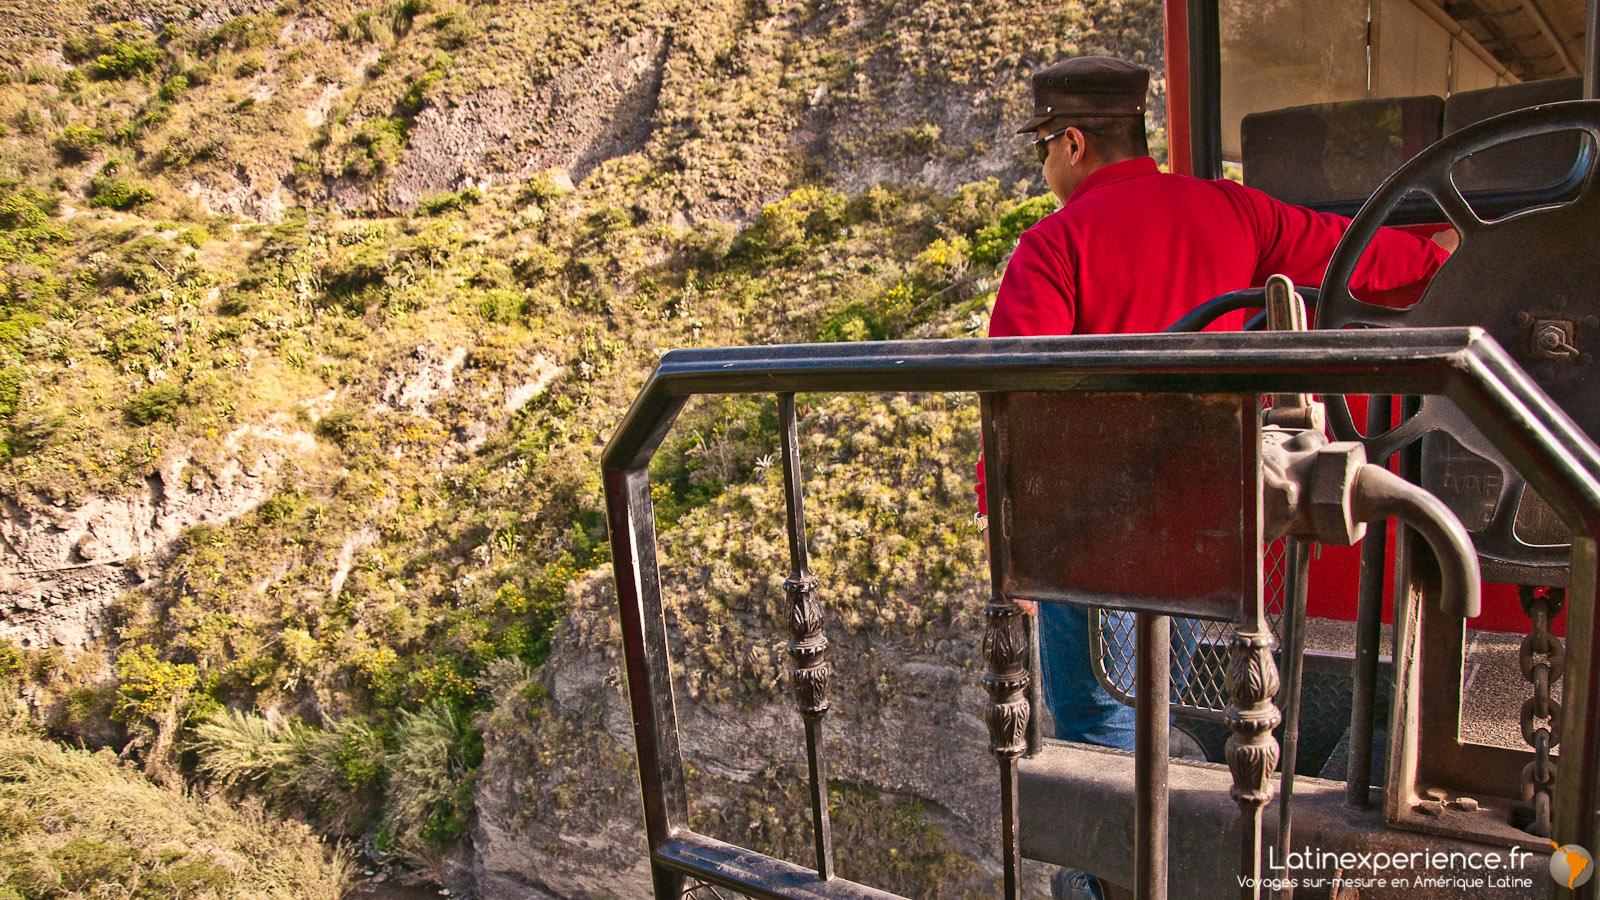 Equateur - Salinas - Train - Latinexperience voyages